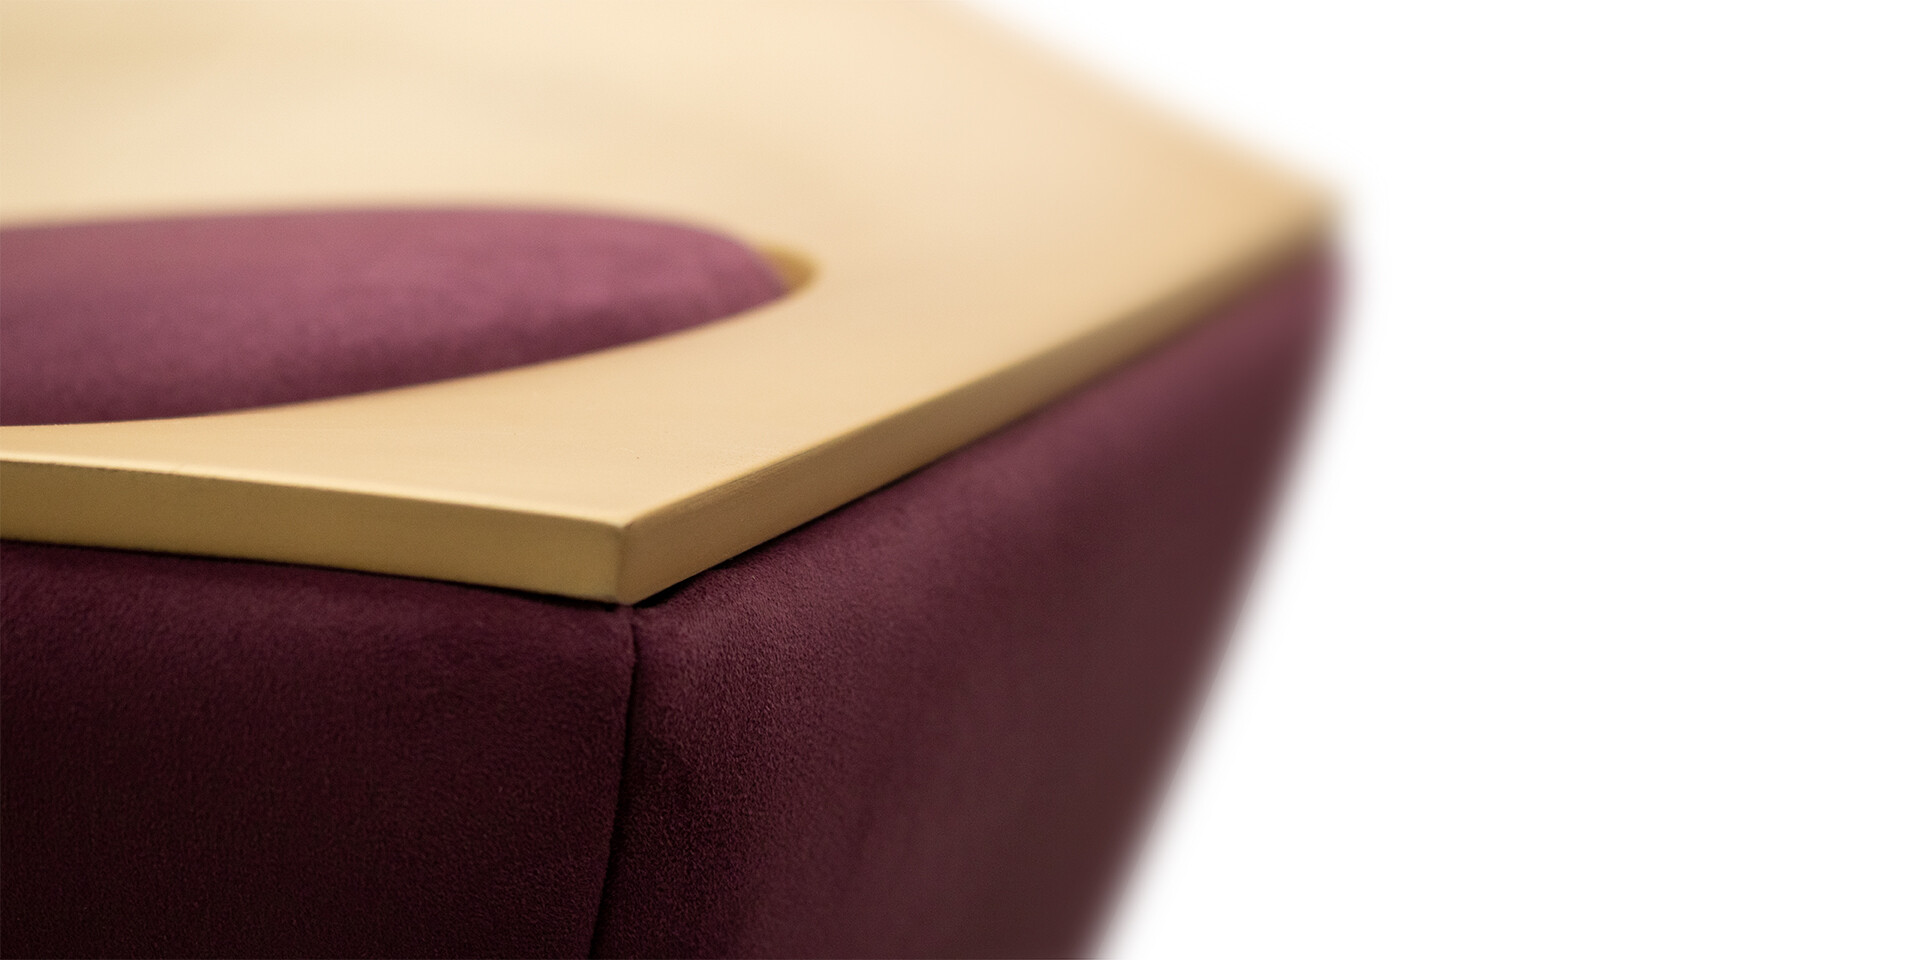 MCCOOL SIDE TABLE - Detail Top Side View - ALMA de LUCE